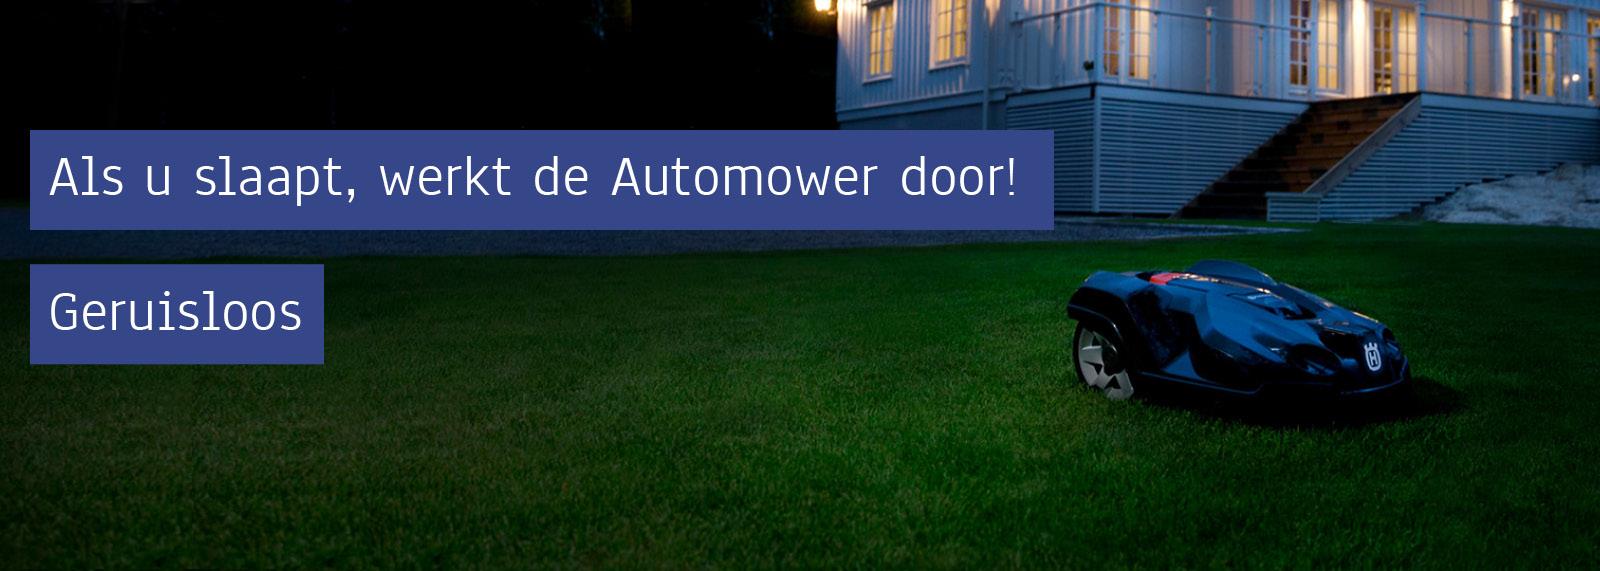 Geruisloos Husqvarna Automower Robotmaaier